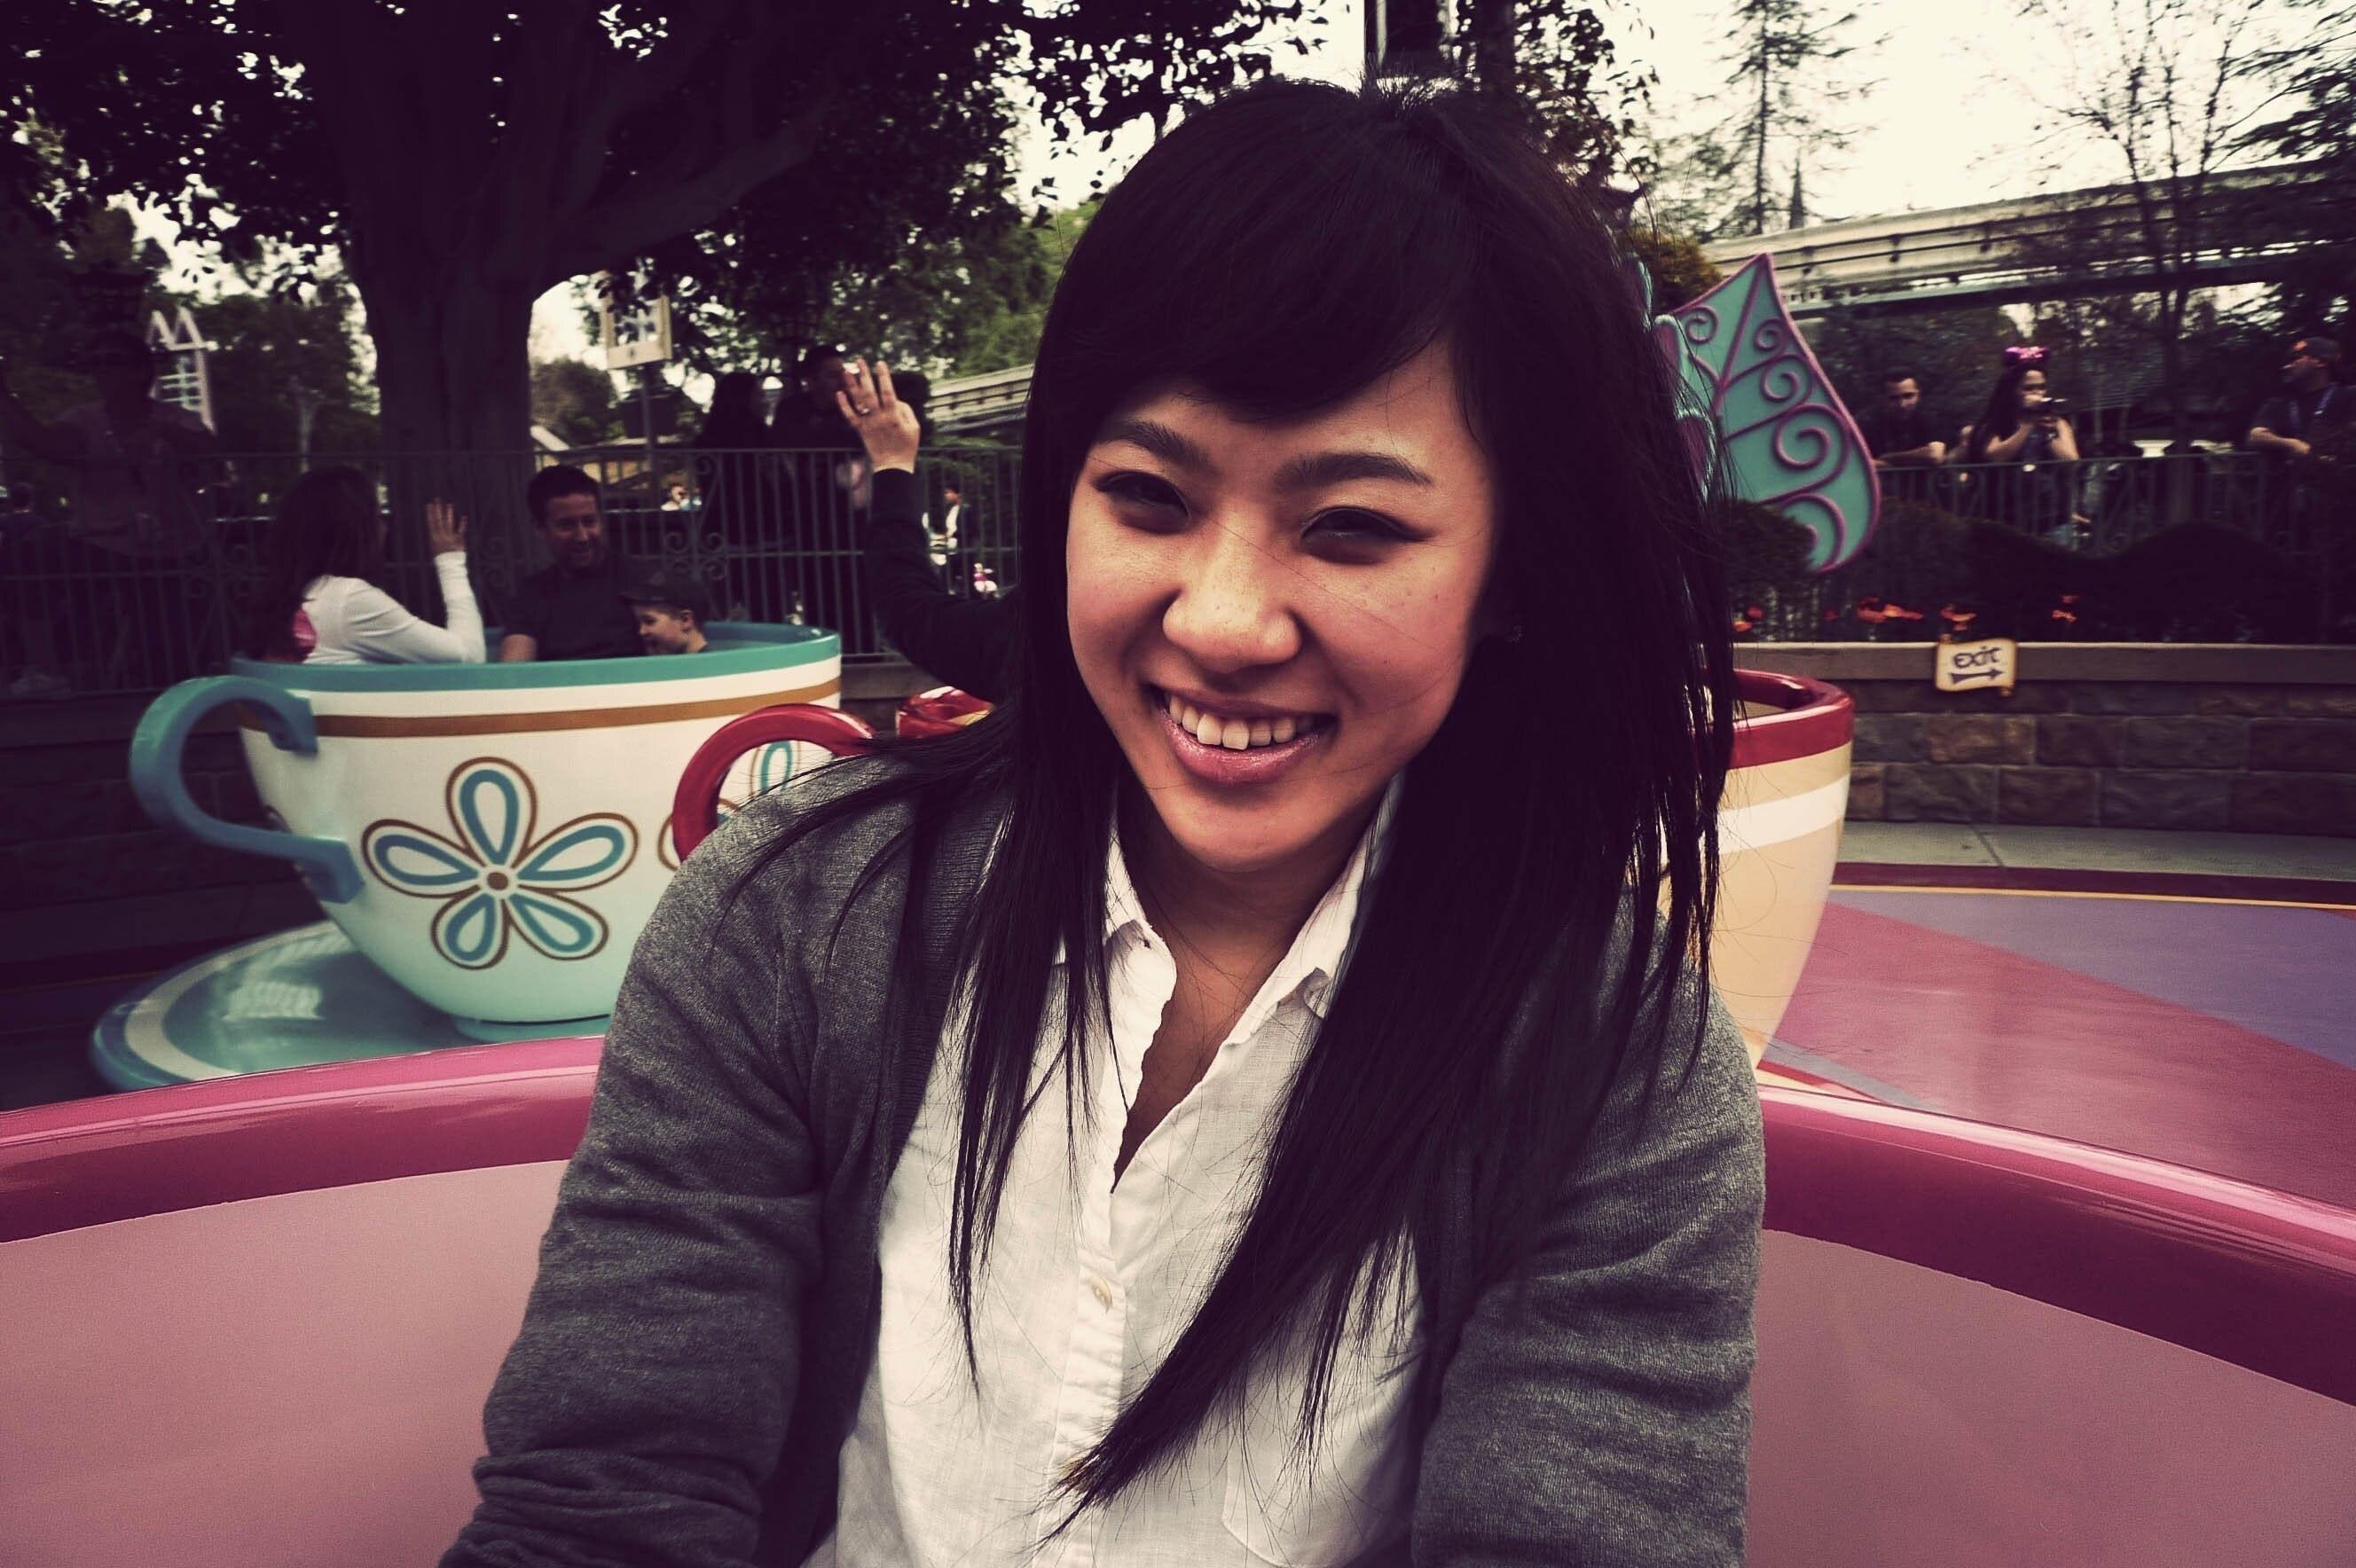 Grace Jiyoung